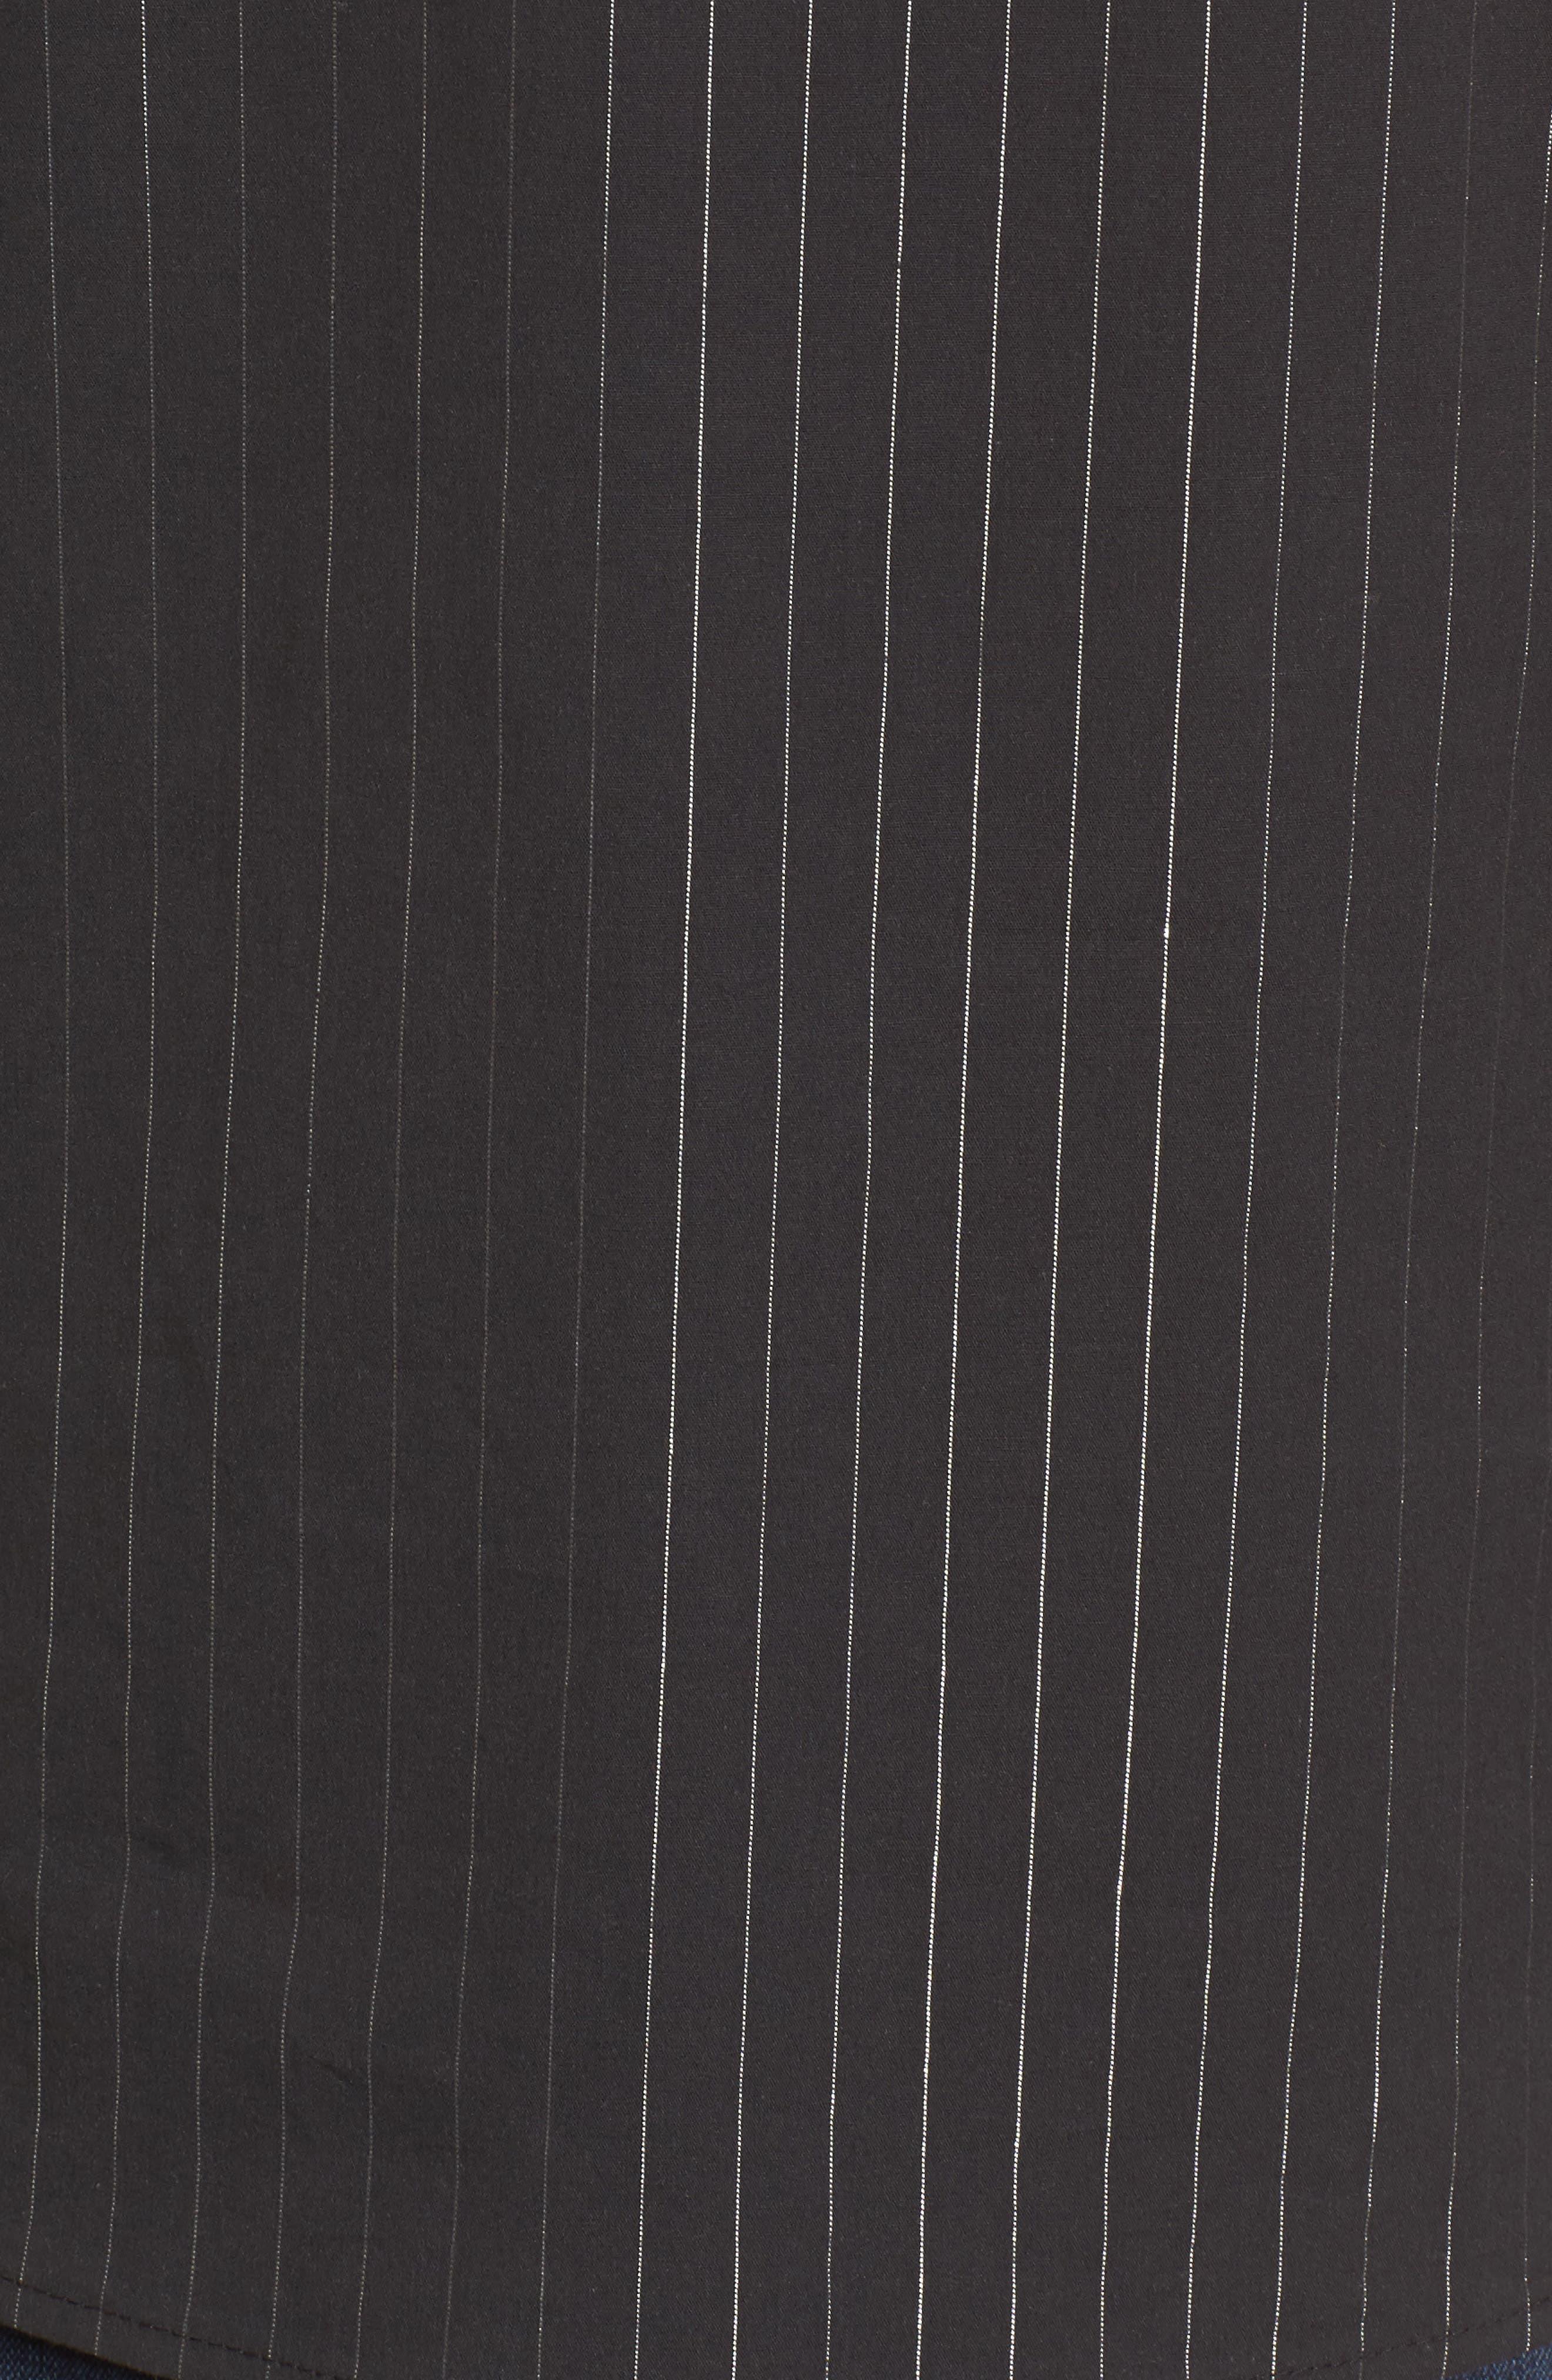 Ruched Sleeve Stripe Top,                             Alternate thumbnail 5, color,                             Black Wide Lurex Stripe